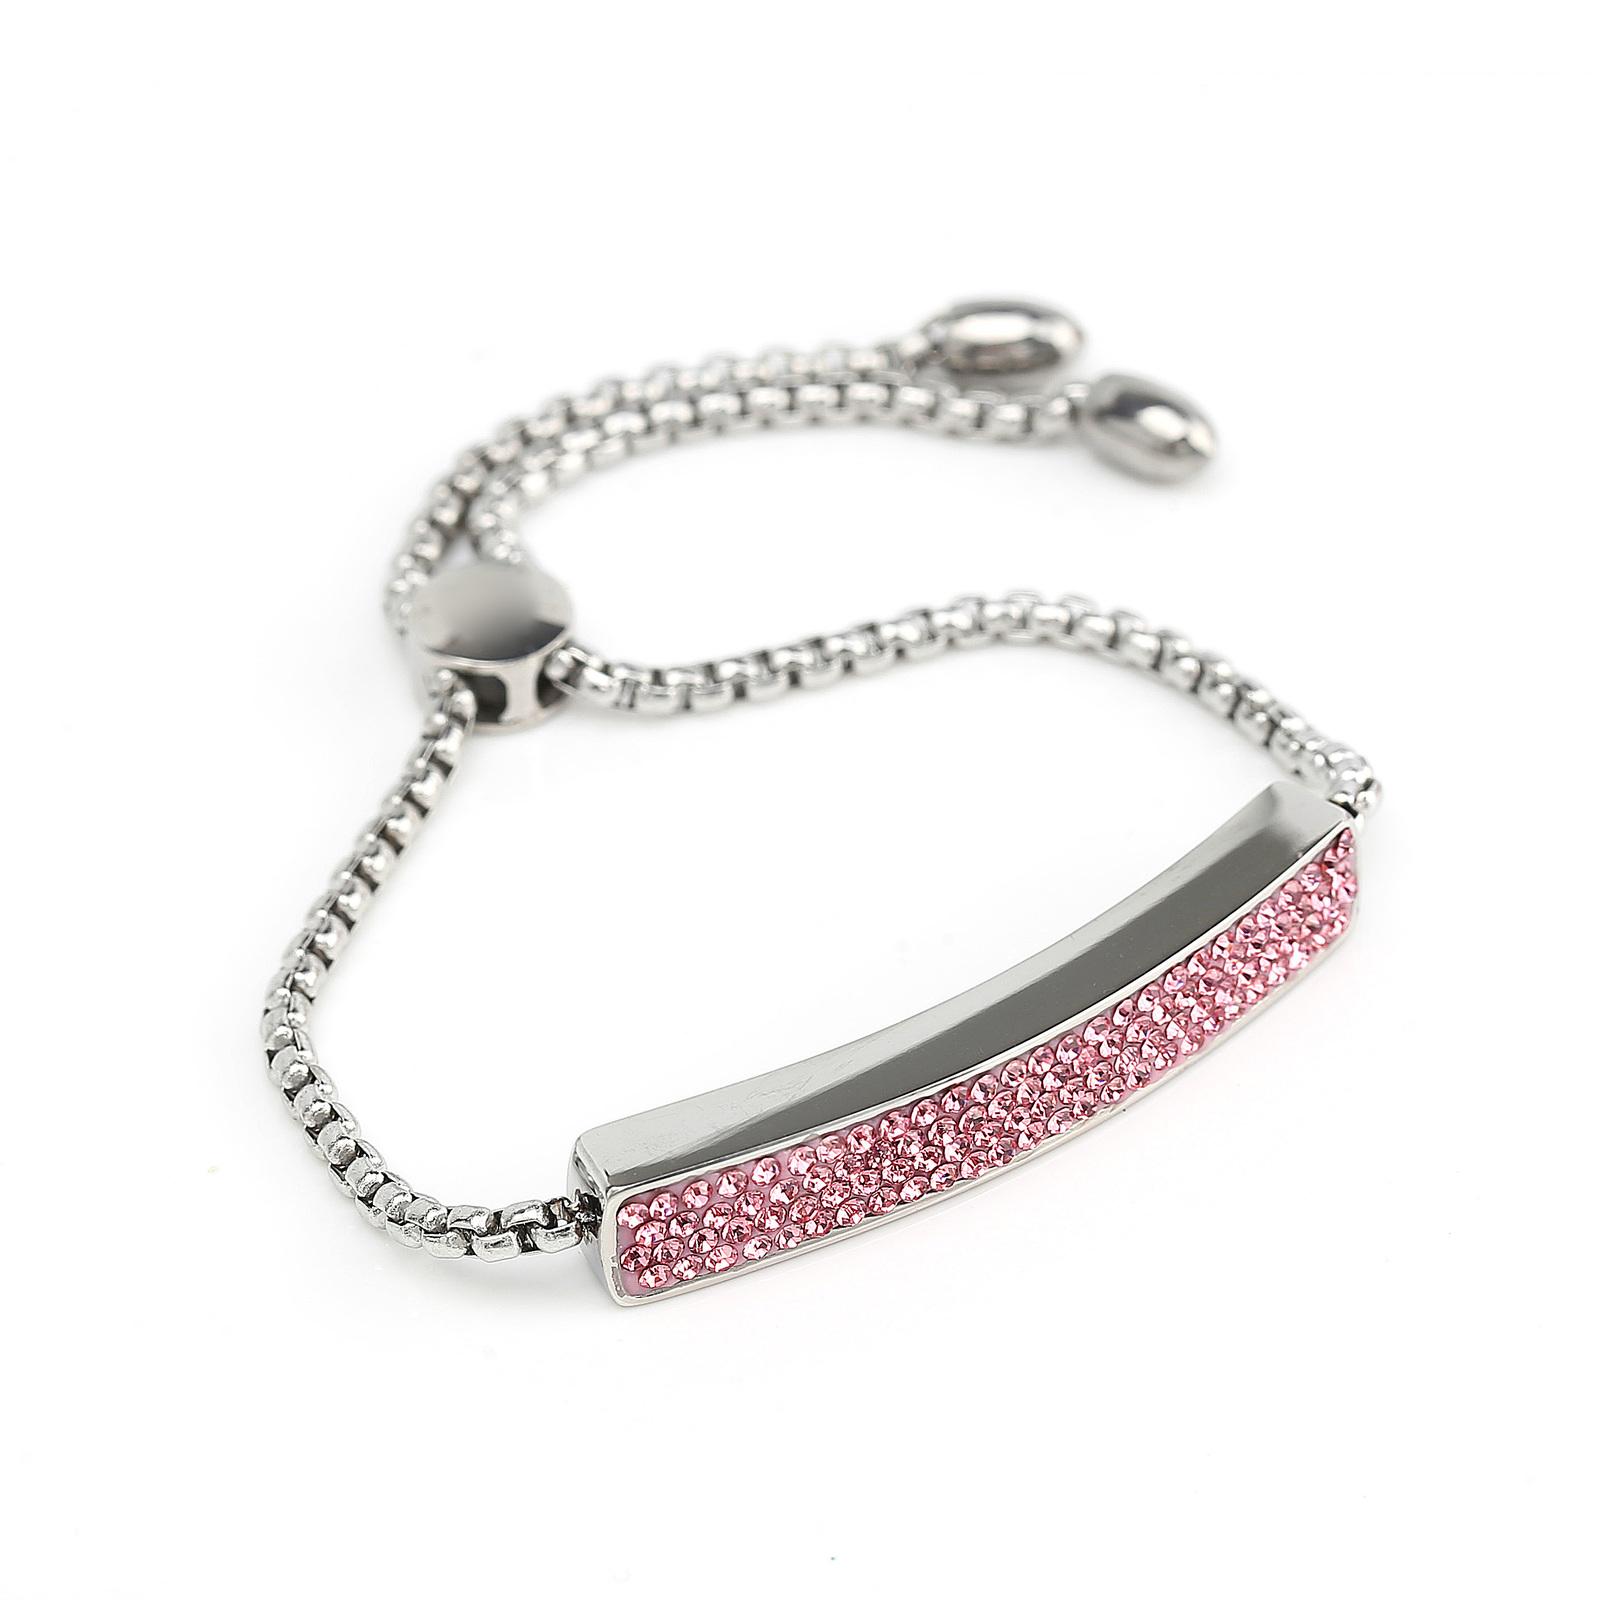 UNITED ELEGANCE Silver Tone Bolo Bar Bracelet With Pink Swarovski Style Crystals